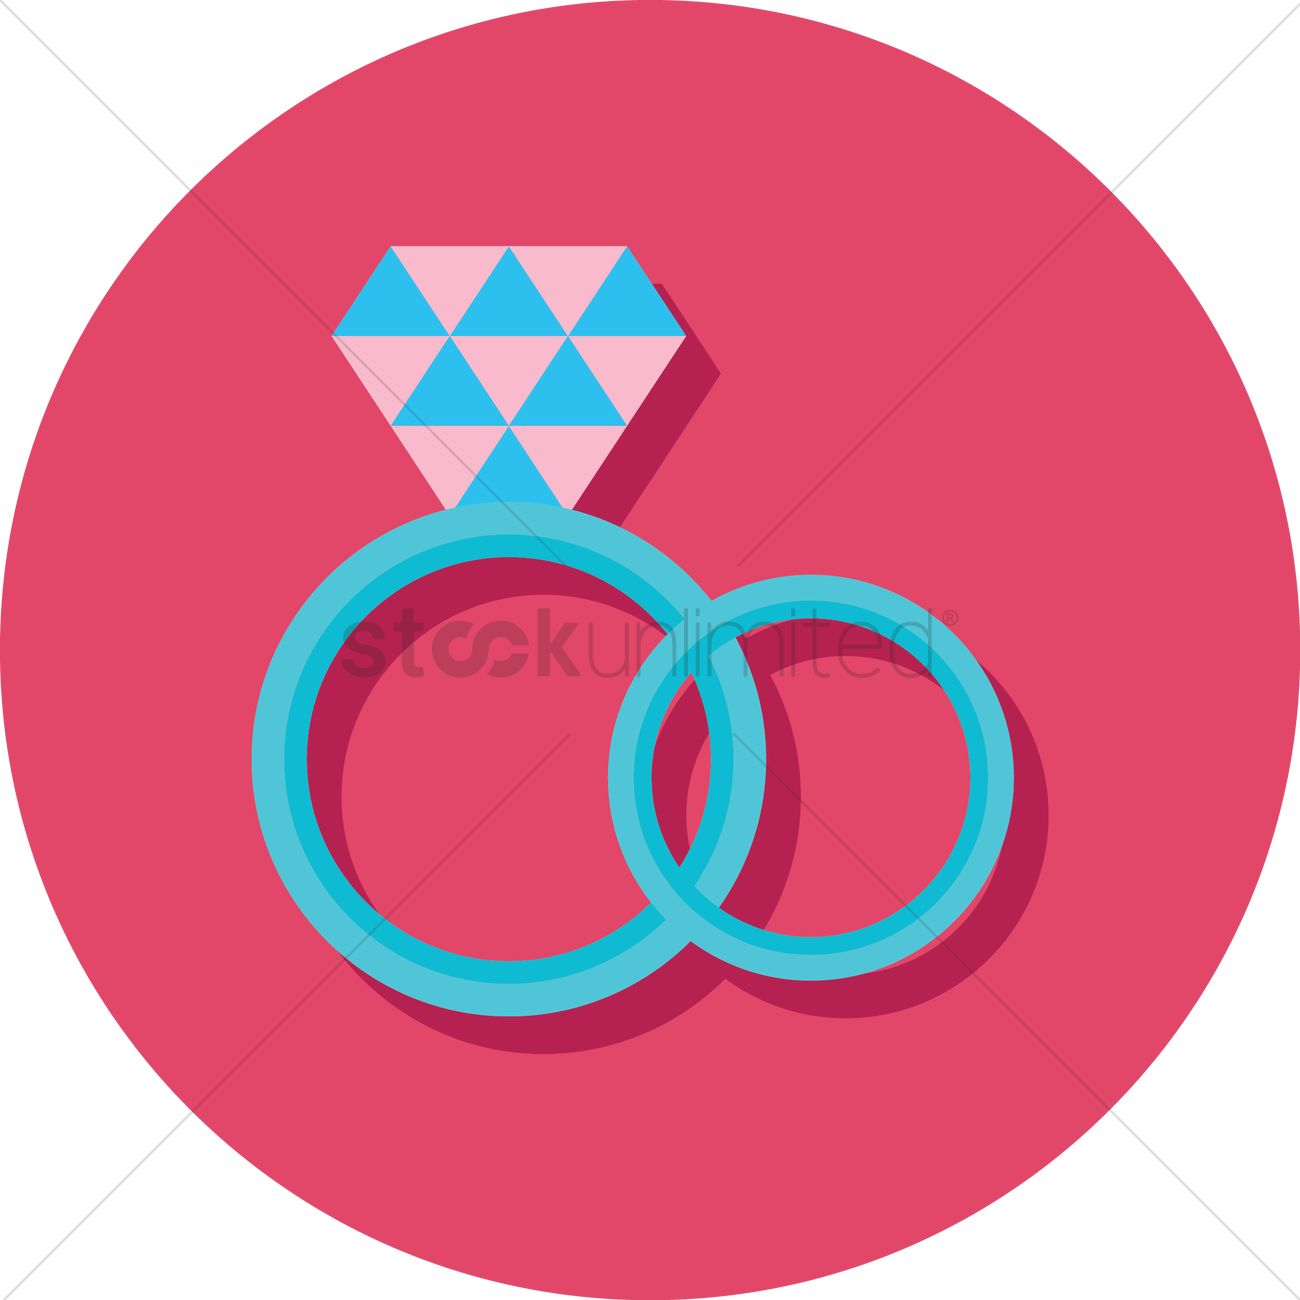 Wedding rings Vector Image - 1327093 | StockUnlimited